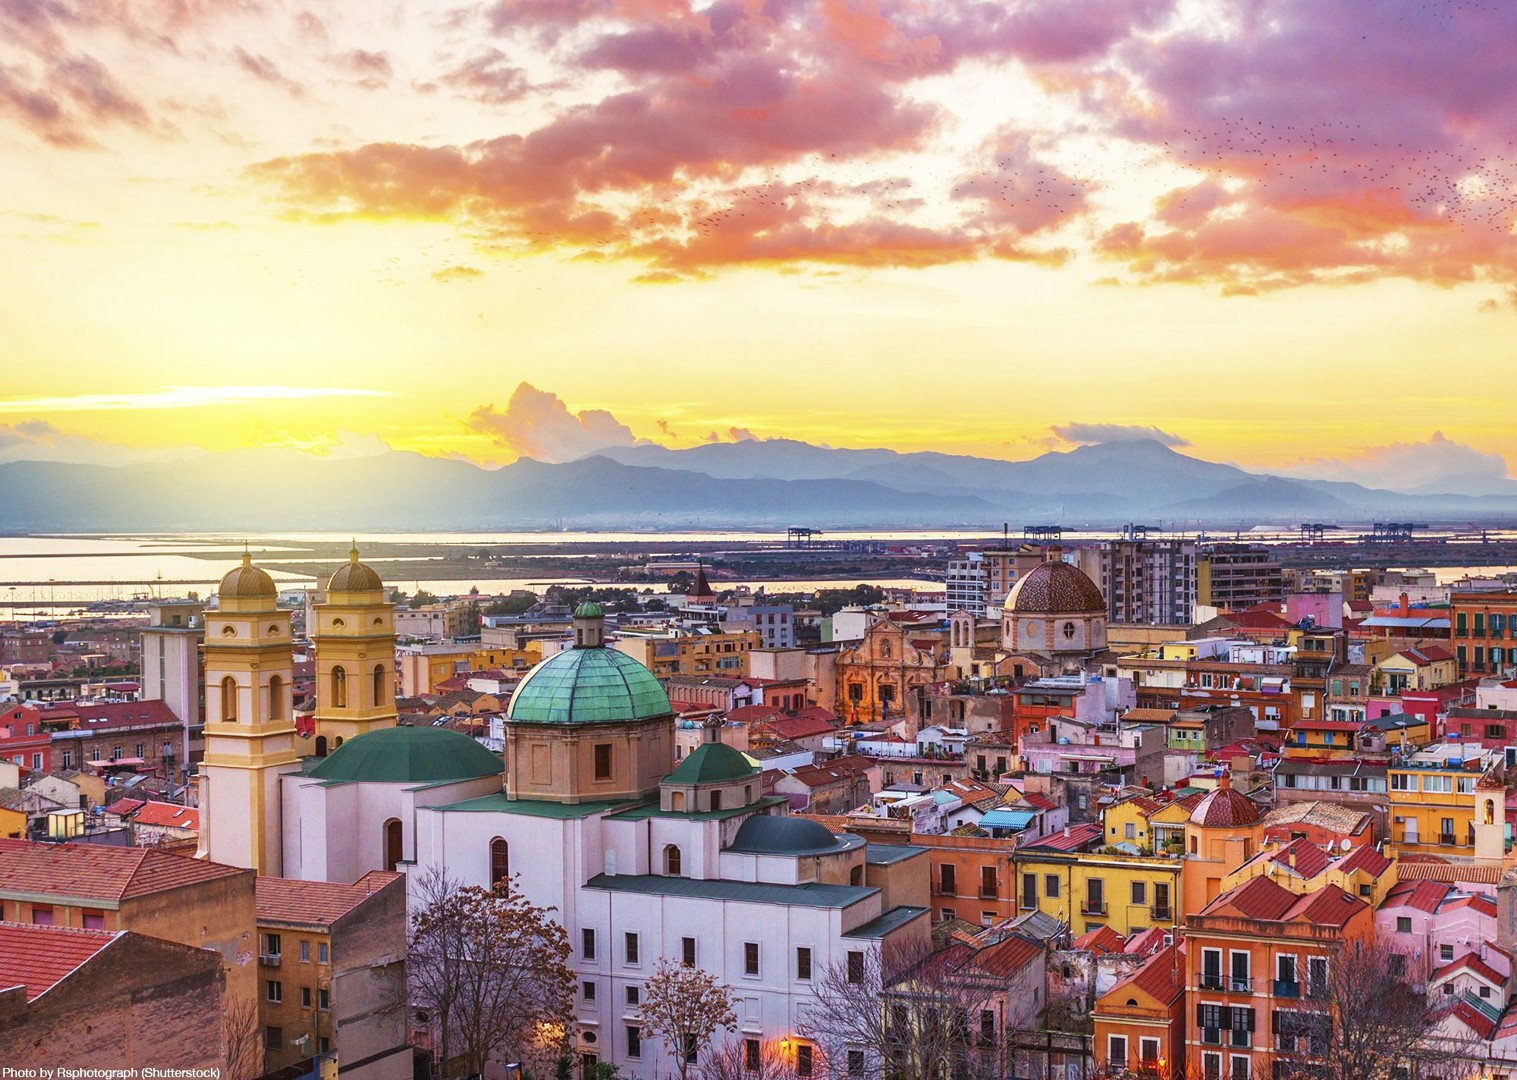 cagliari-sardinia-italy-west-coast-wonders-leisure-cycling-tour.jpg - Italy - Sardinia - West Coast Wonders - Self-Guided Leisure Cycling Holiday - Leisure Cycling